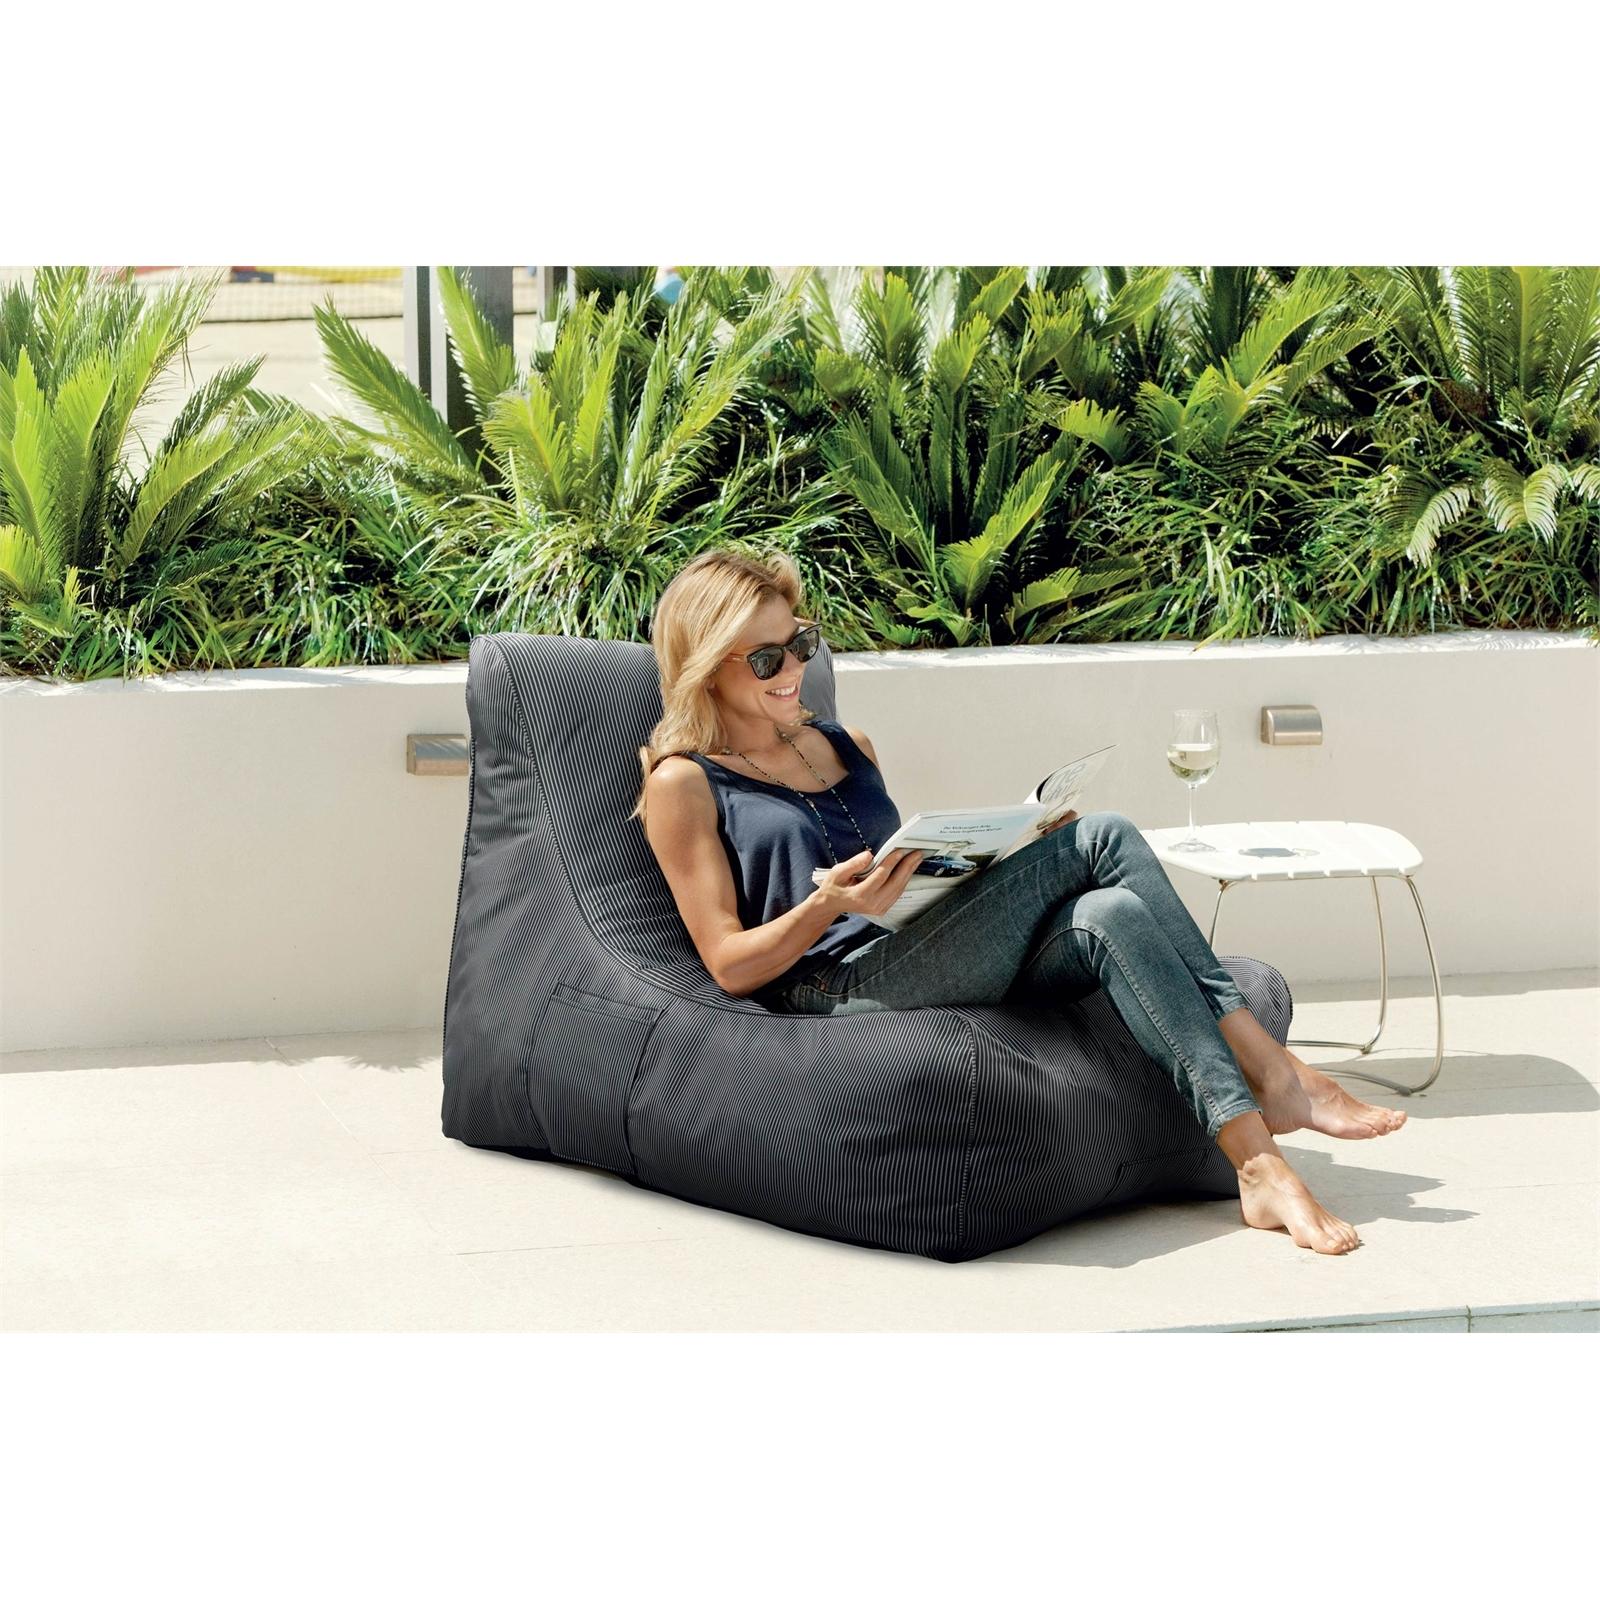 Mojo Classic Pinstripe MyLounge Outdoor Cushion